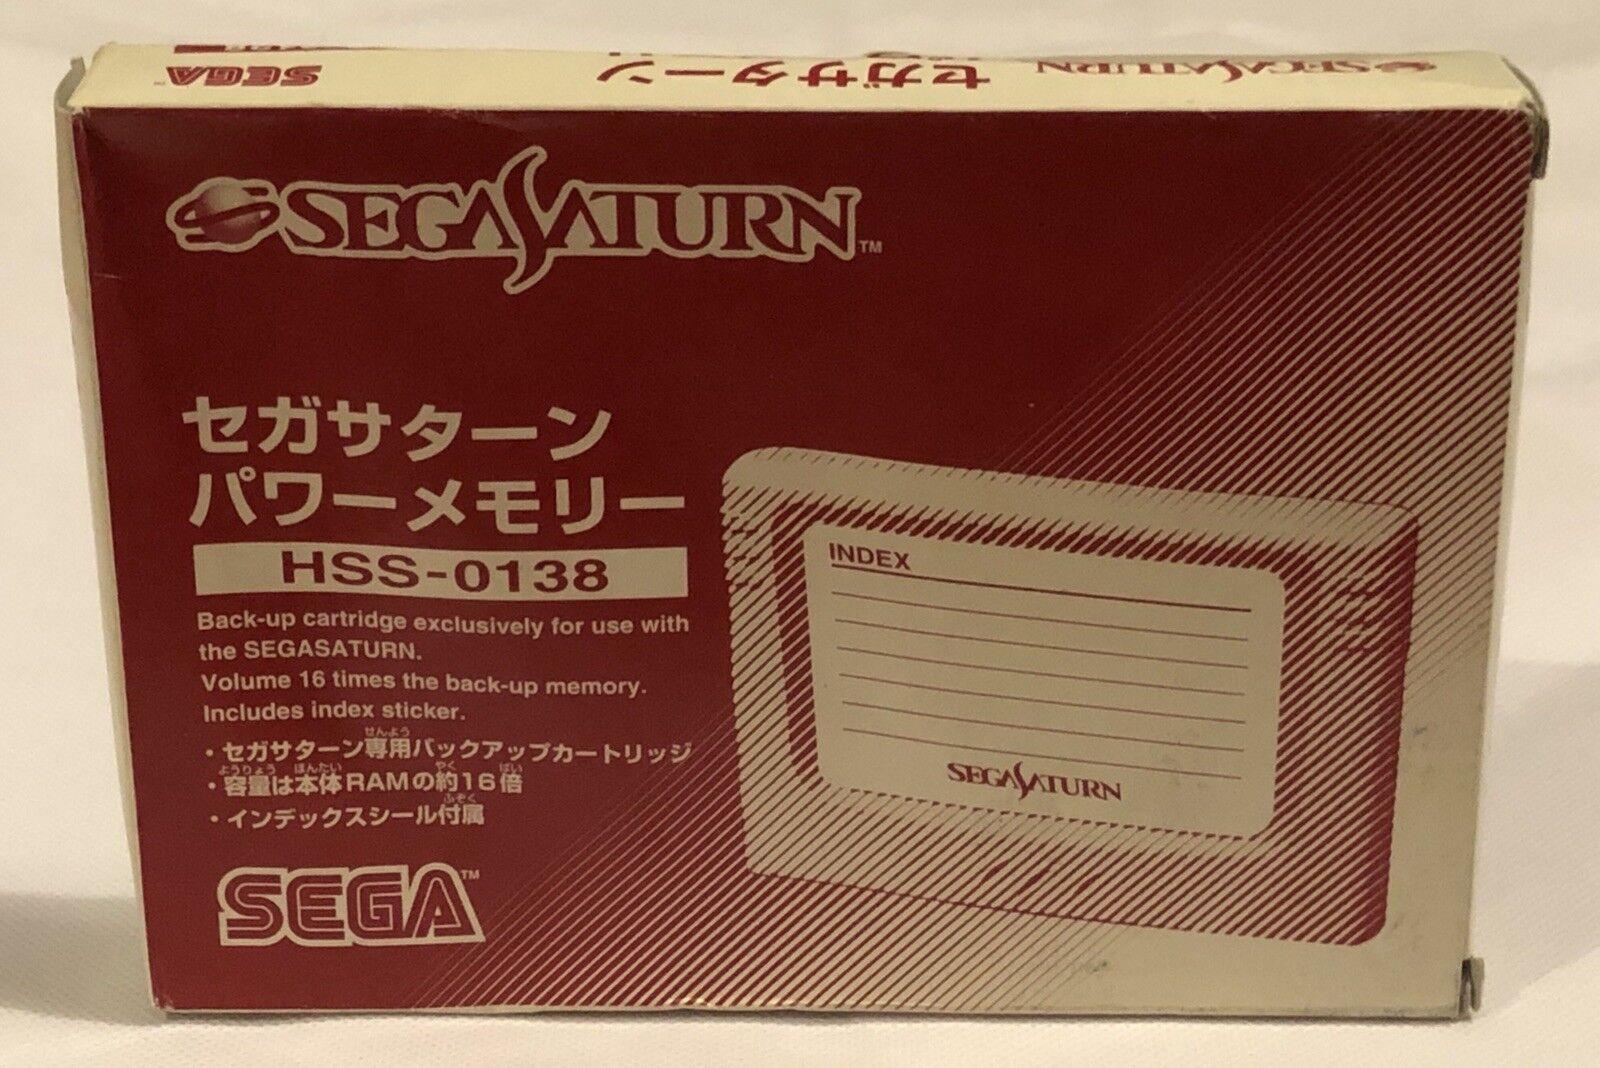 Sega Saturn - Power Backup Memory RAM Cartridge (Complete) NTSC-J HSS-0138 JAPAN